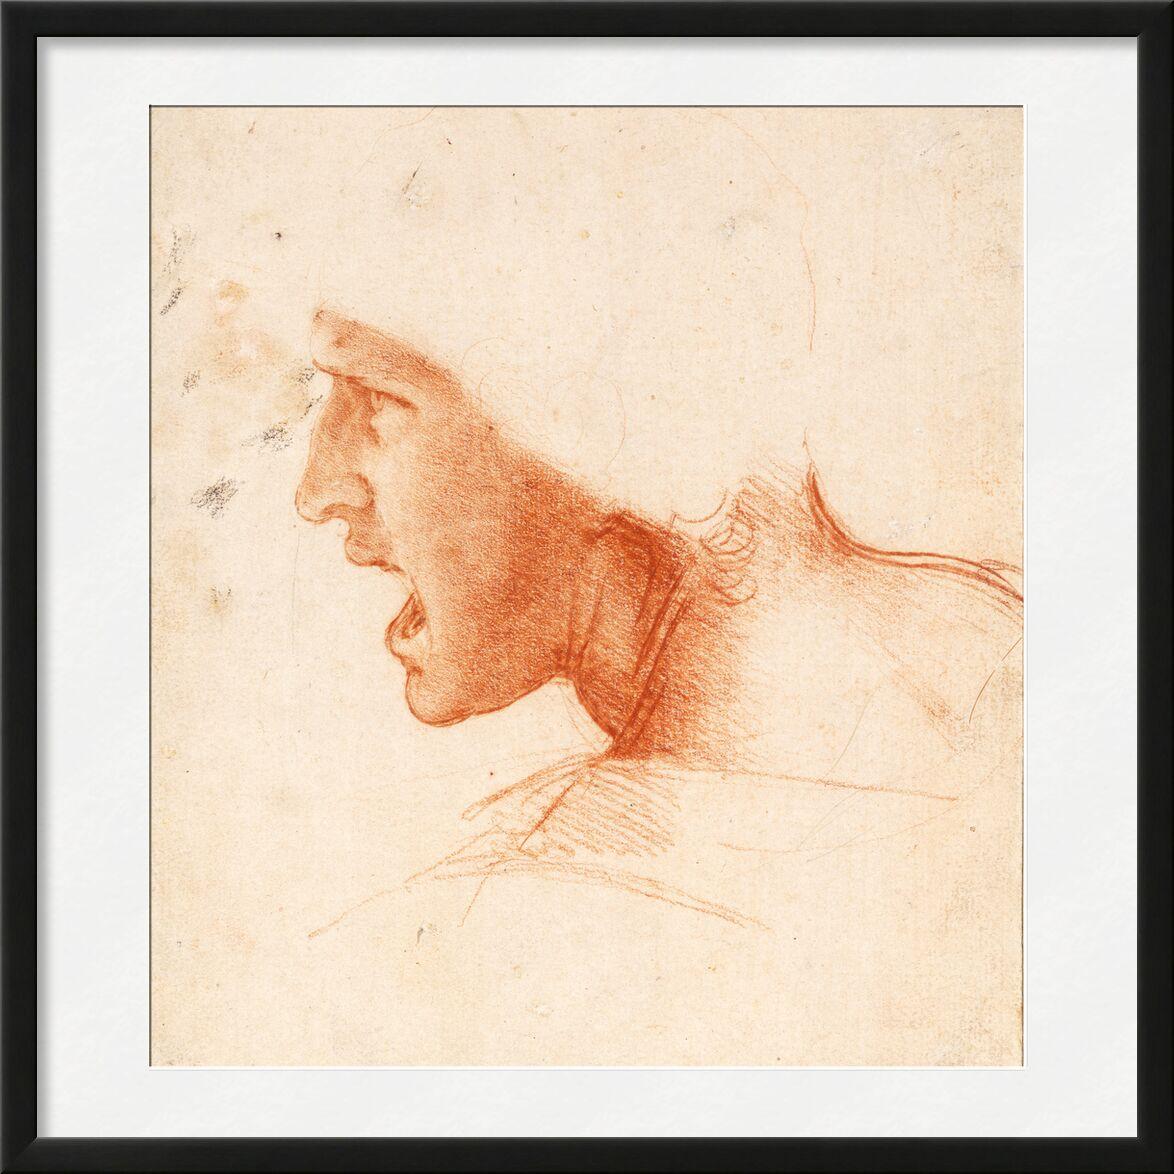 Recto Study for the Head of a Soldier in the Battle of Anghiari - Leonardo da Vinci von AUX BEAUX-ARTS, Prodi Art, Porträt, Leonard de Vinci, Soldat, Krieg, Bleistift, Zeichnung